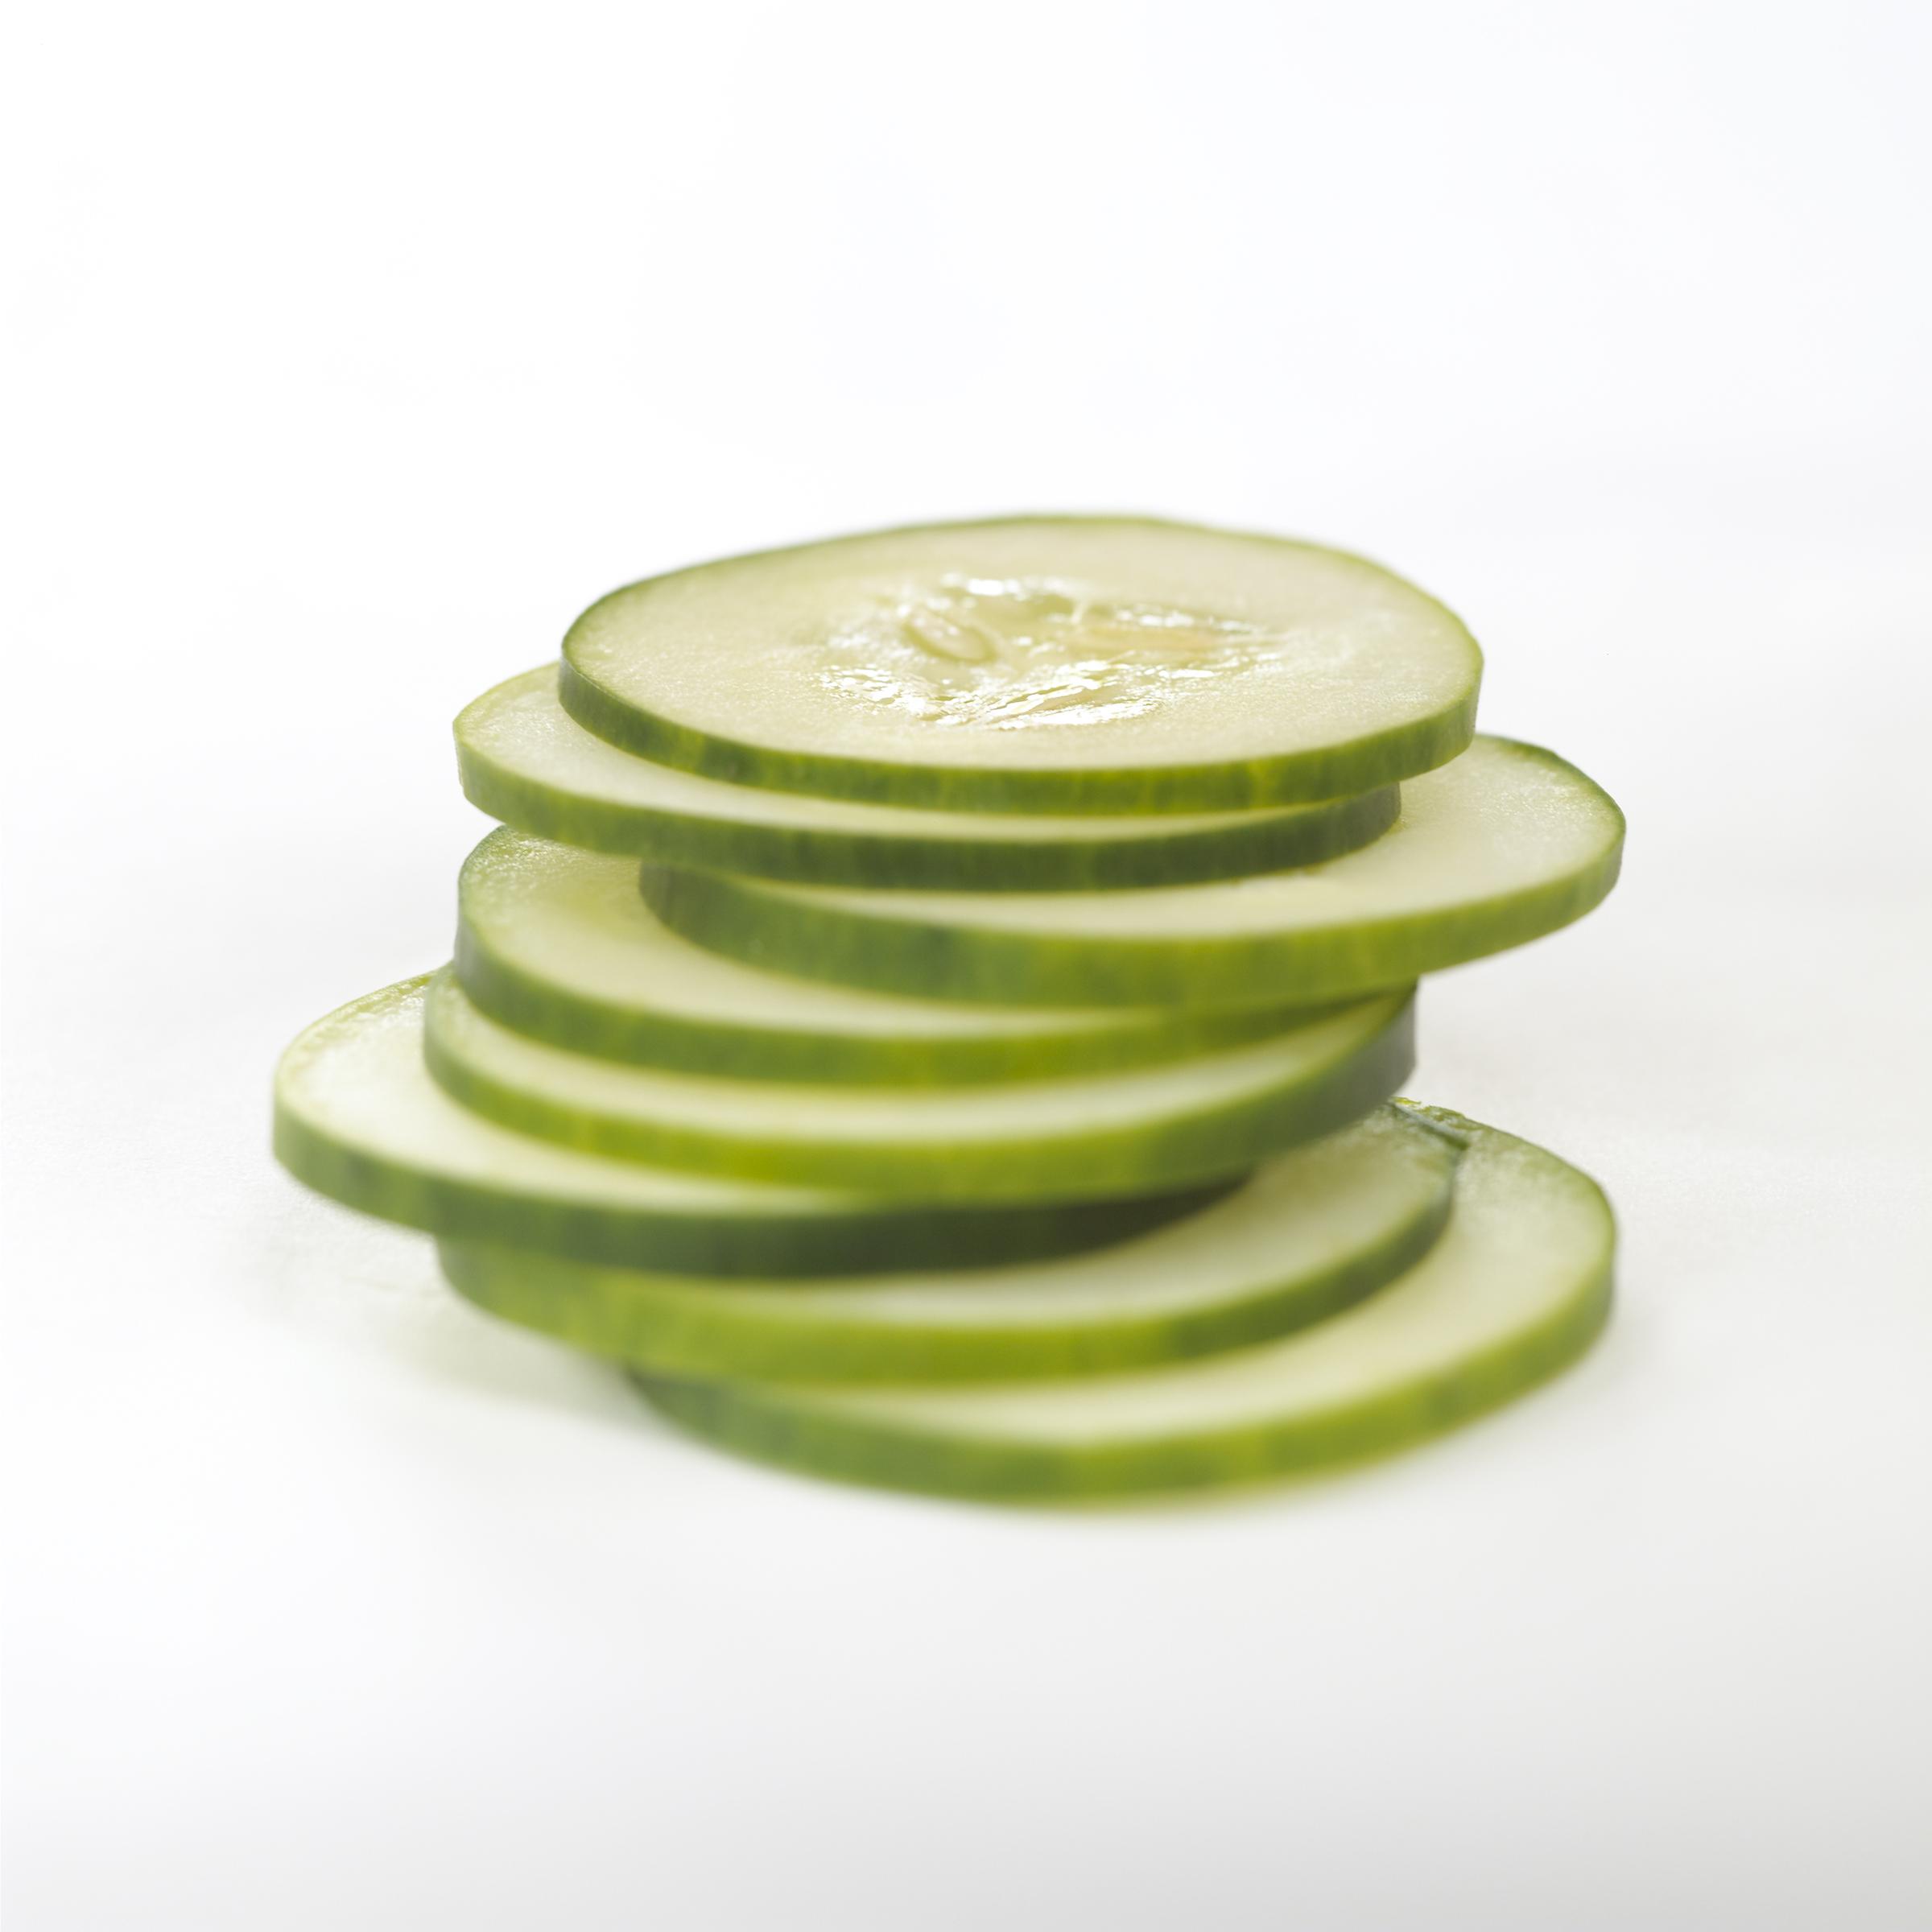 cucumber 1203.jpg